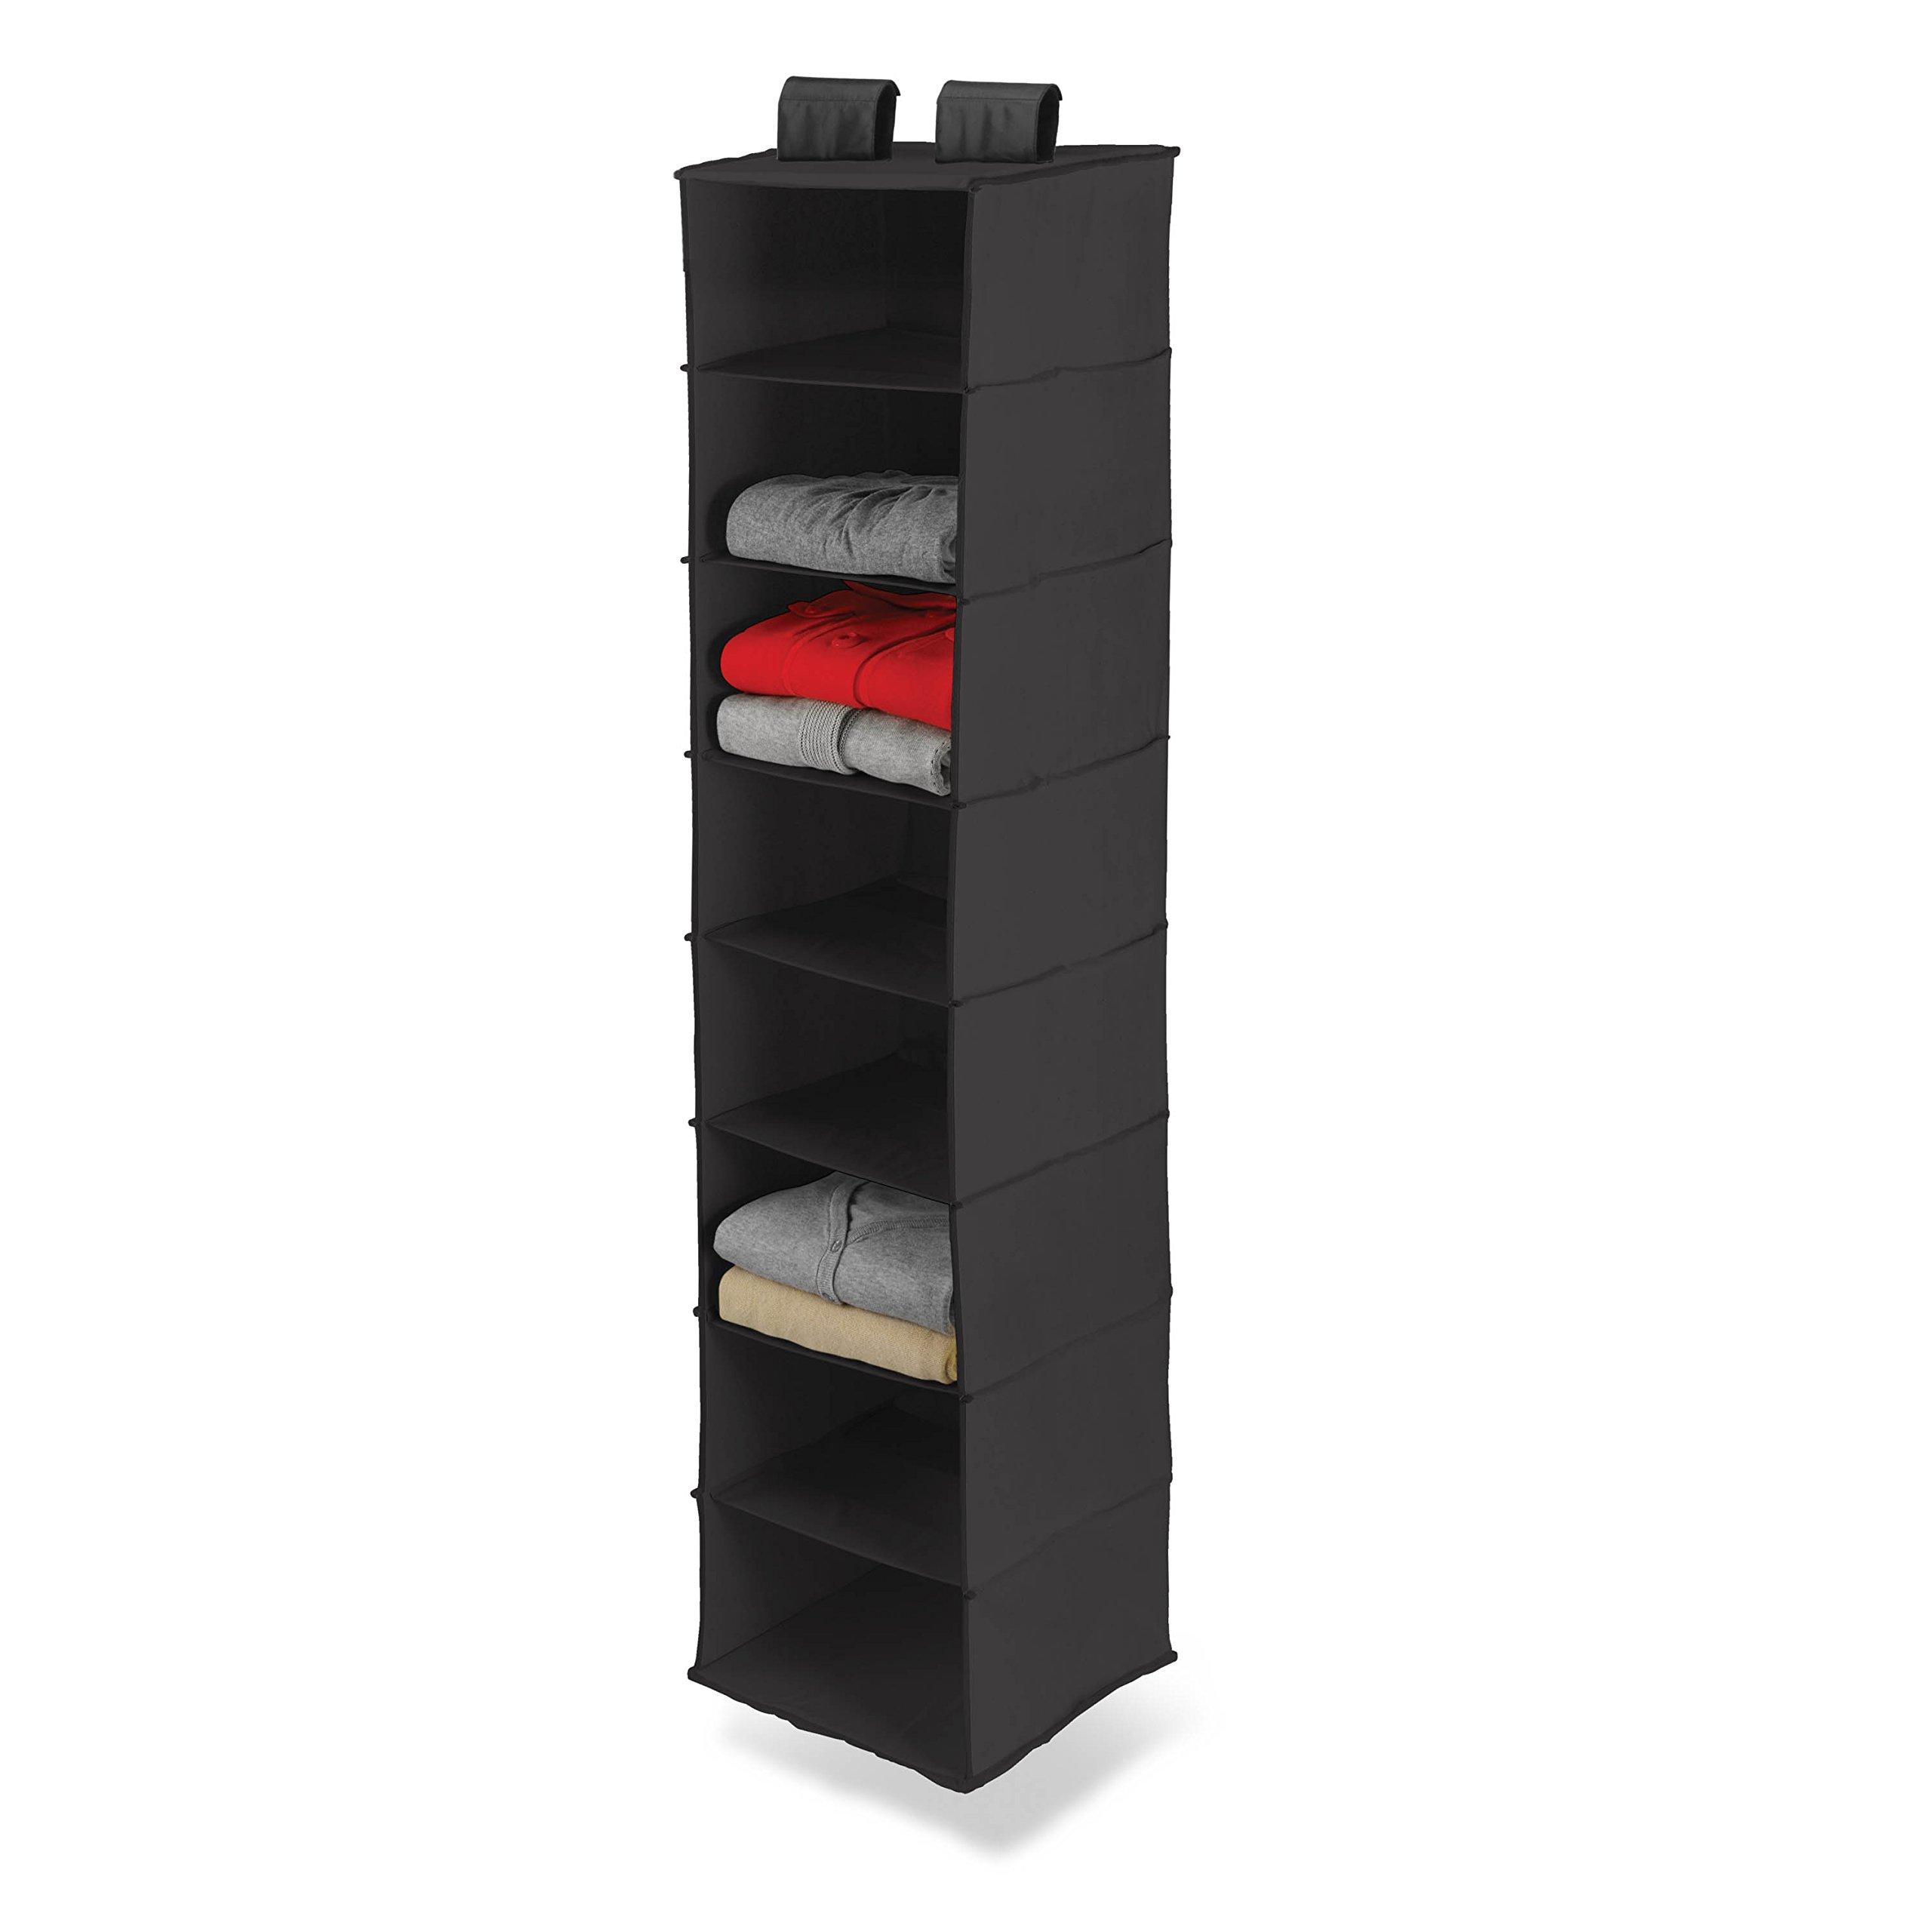 hanging storage tulum wardrobe smsender co closet